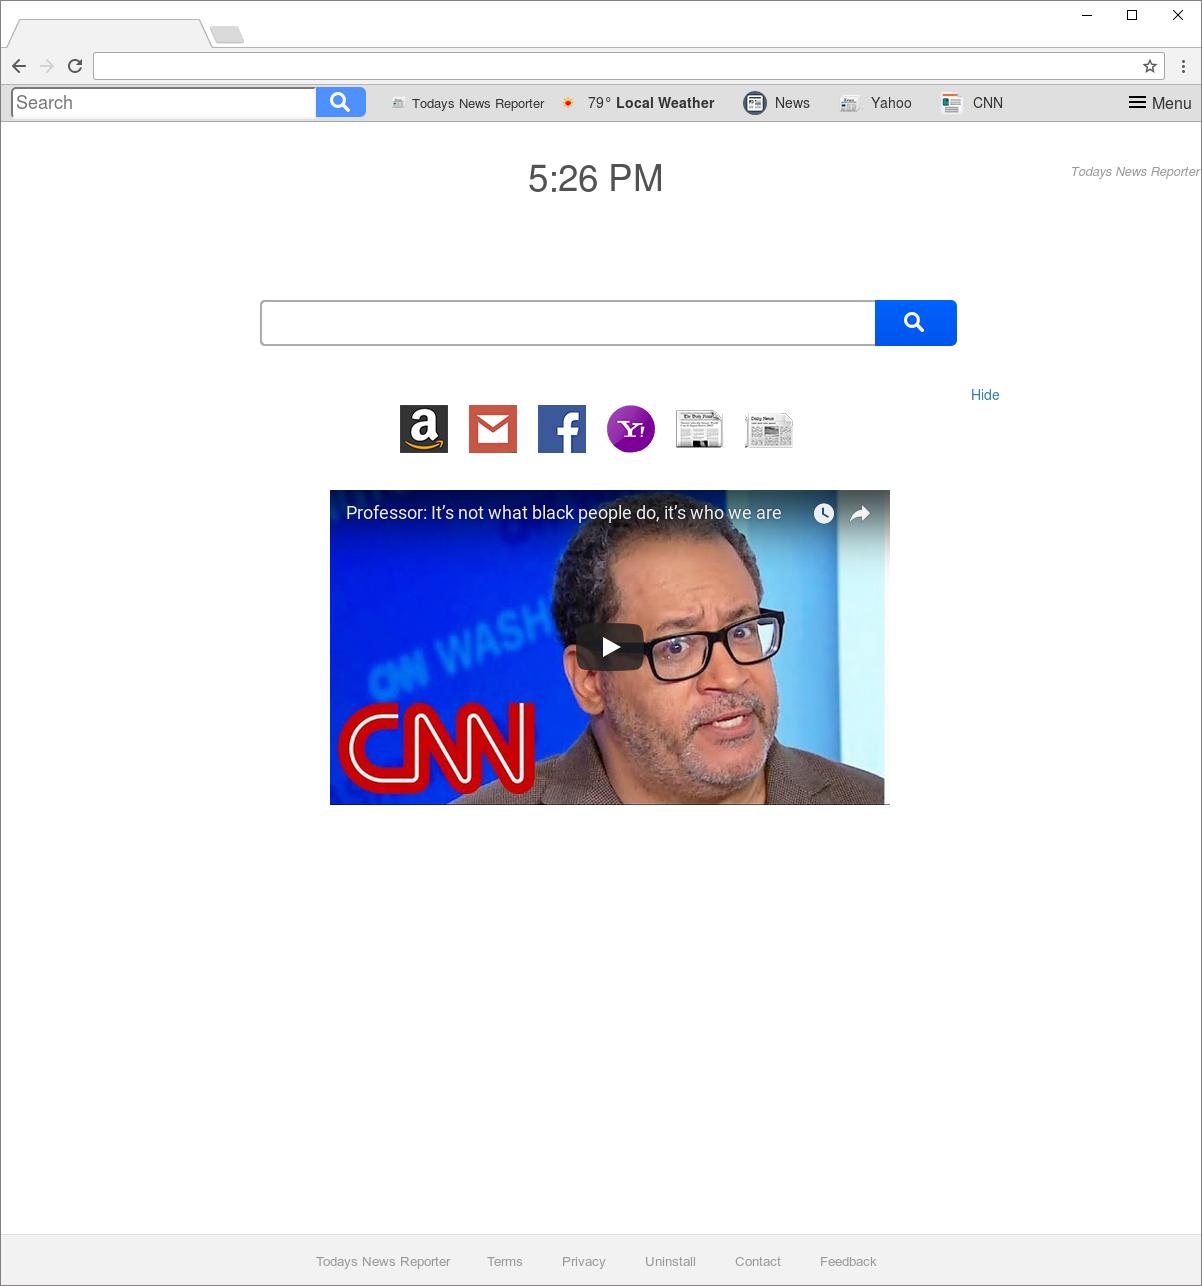 Search.searchtnreporter.com Hijacker